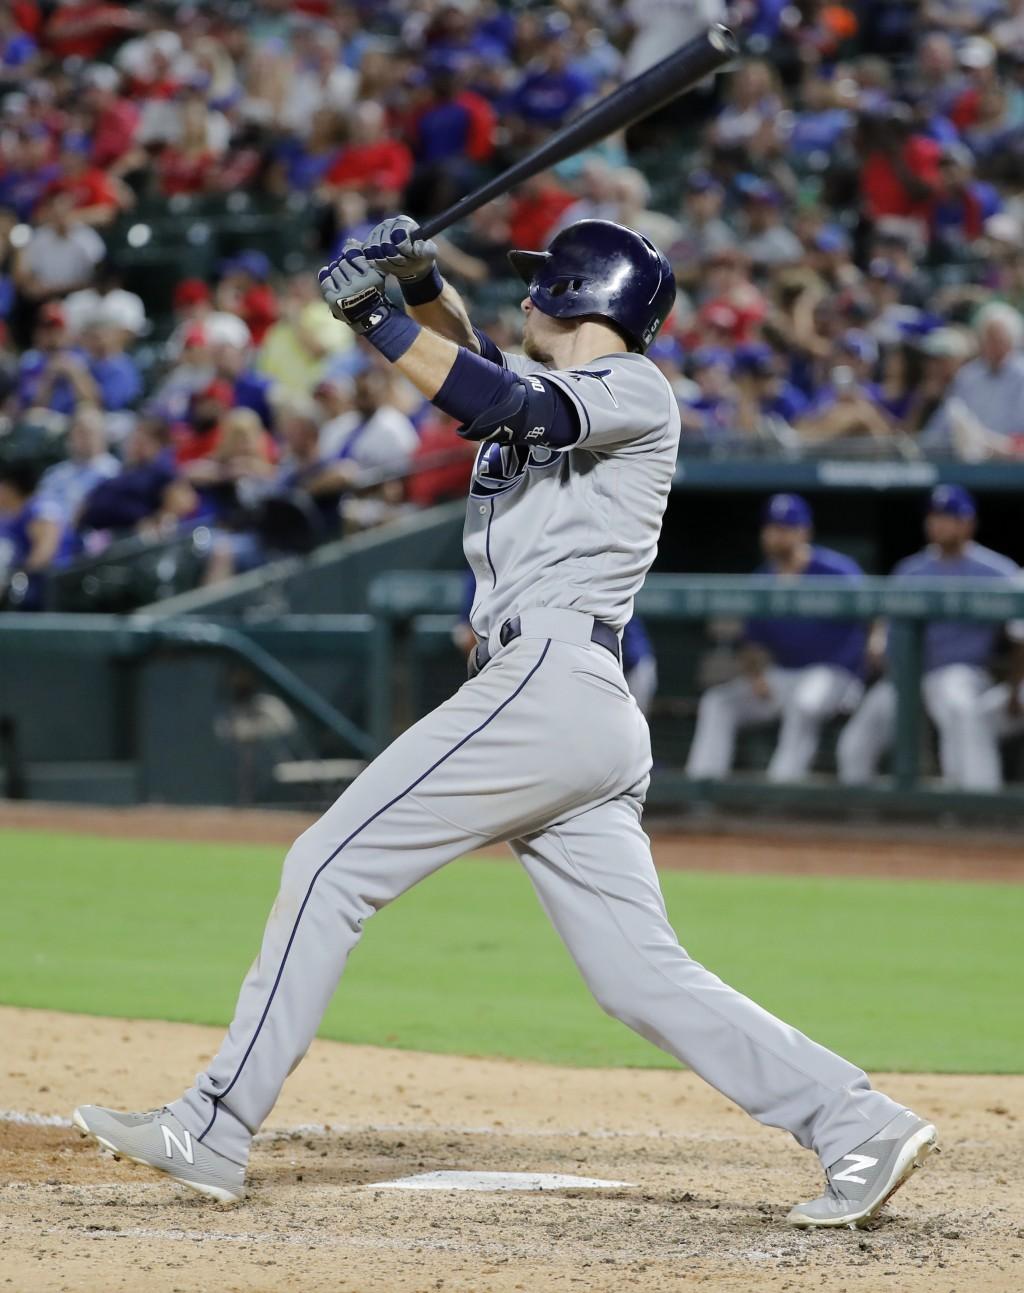 Tampa Bay Rays' Matt Duffy follows through on an RBI sacrifice fly in the fourth inning of a baseball game against the Texas Rangers in Arlington, Tex